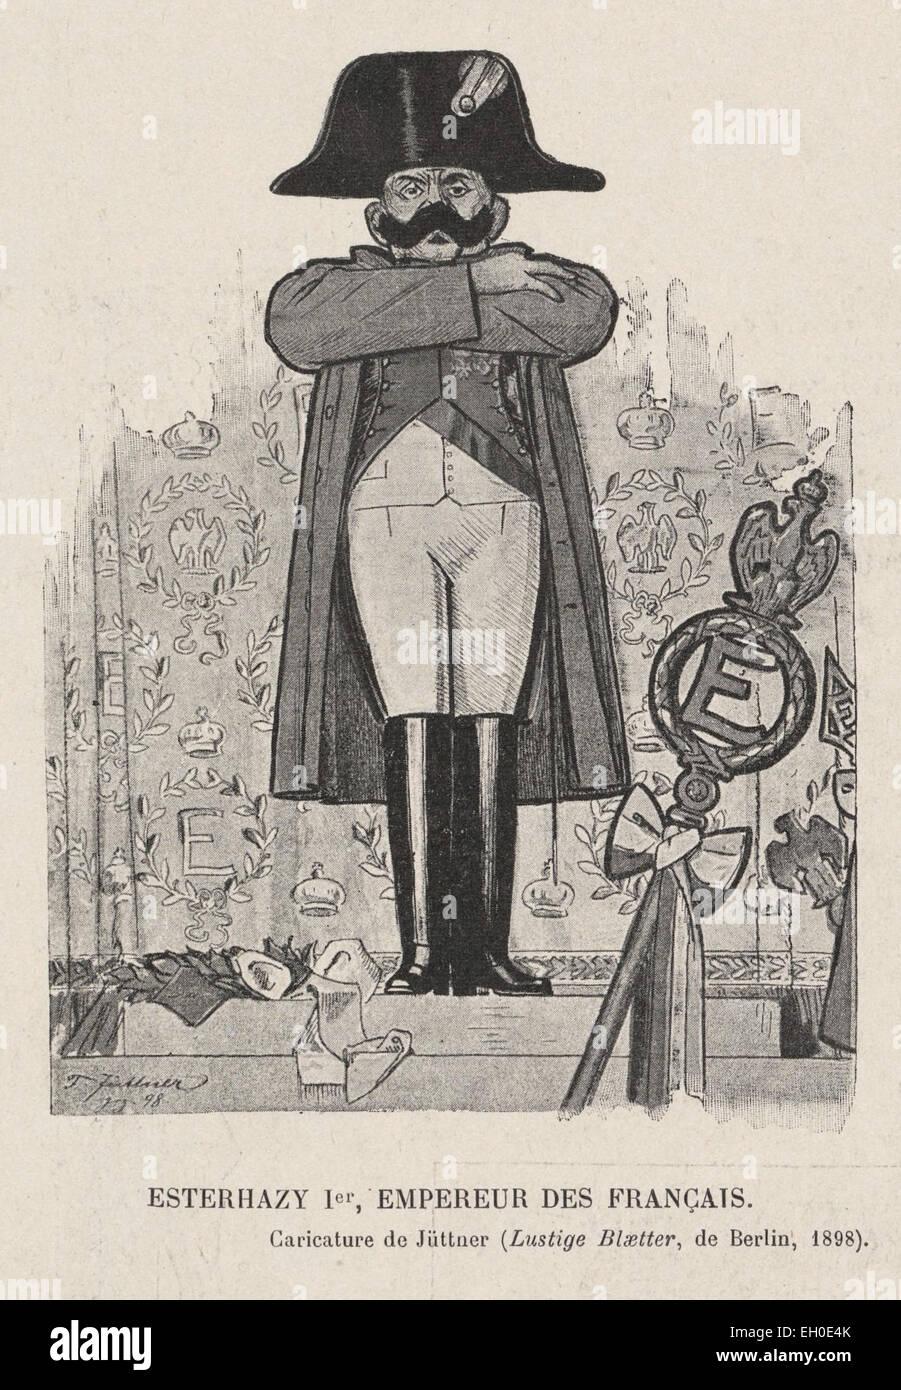 'Esterhazy 1er, Empereur des Français', caricature de Jüttner paru dans les Lustige Blätter - Stock Image